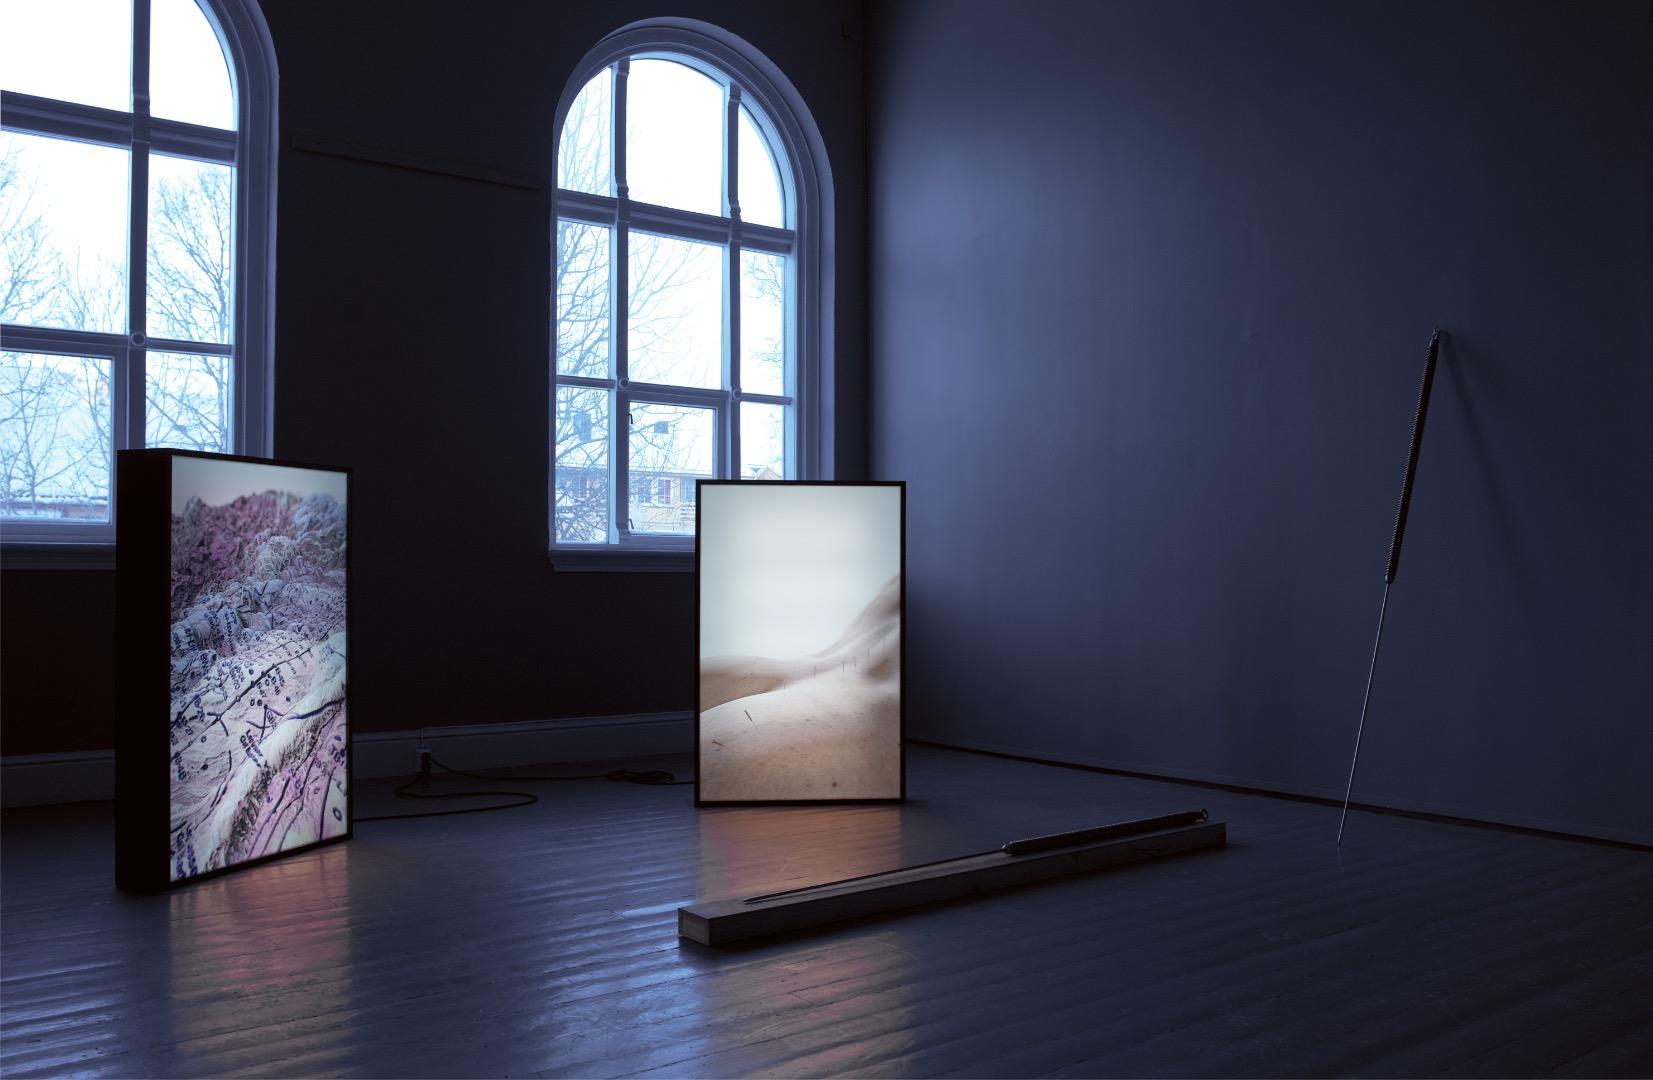 Pressure Point Acupuncture  (2019) av New Mineral Collective. Foto: Vsevolod Kovalevskij/Tromsø Kunstforening